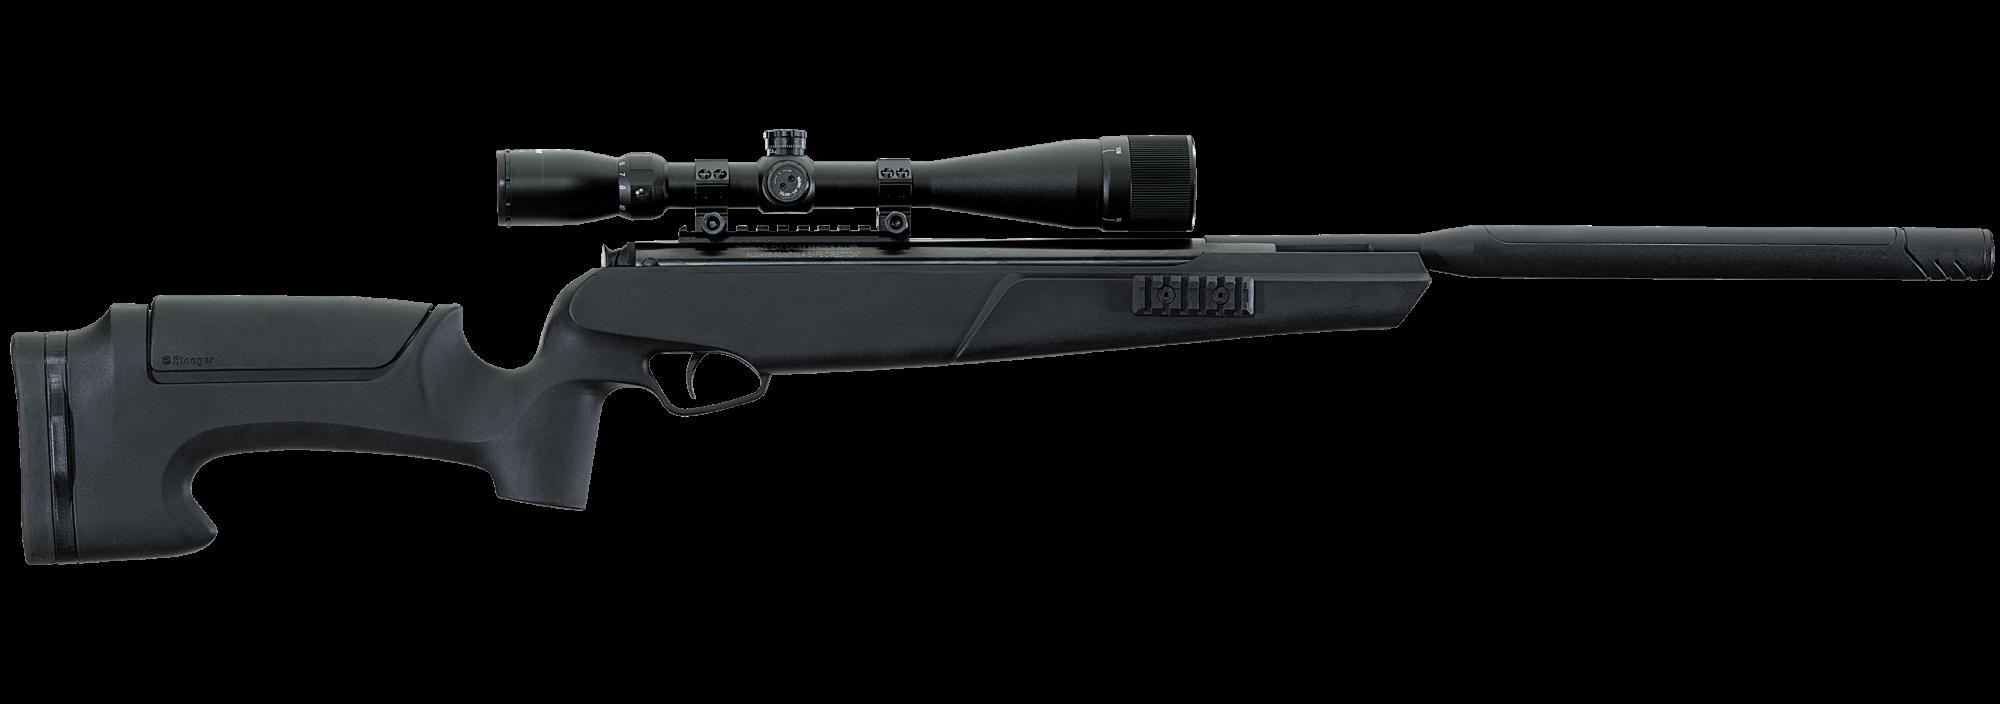 Black Sniper Png Image Sniper Png Guns And Ammo